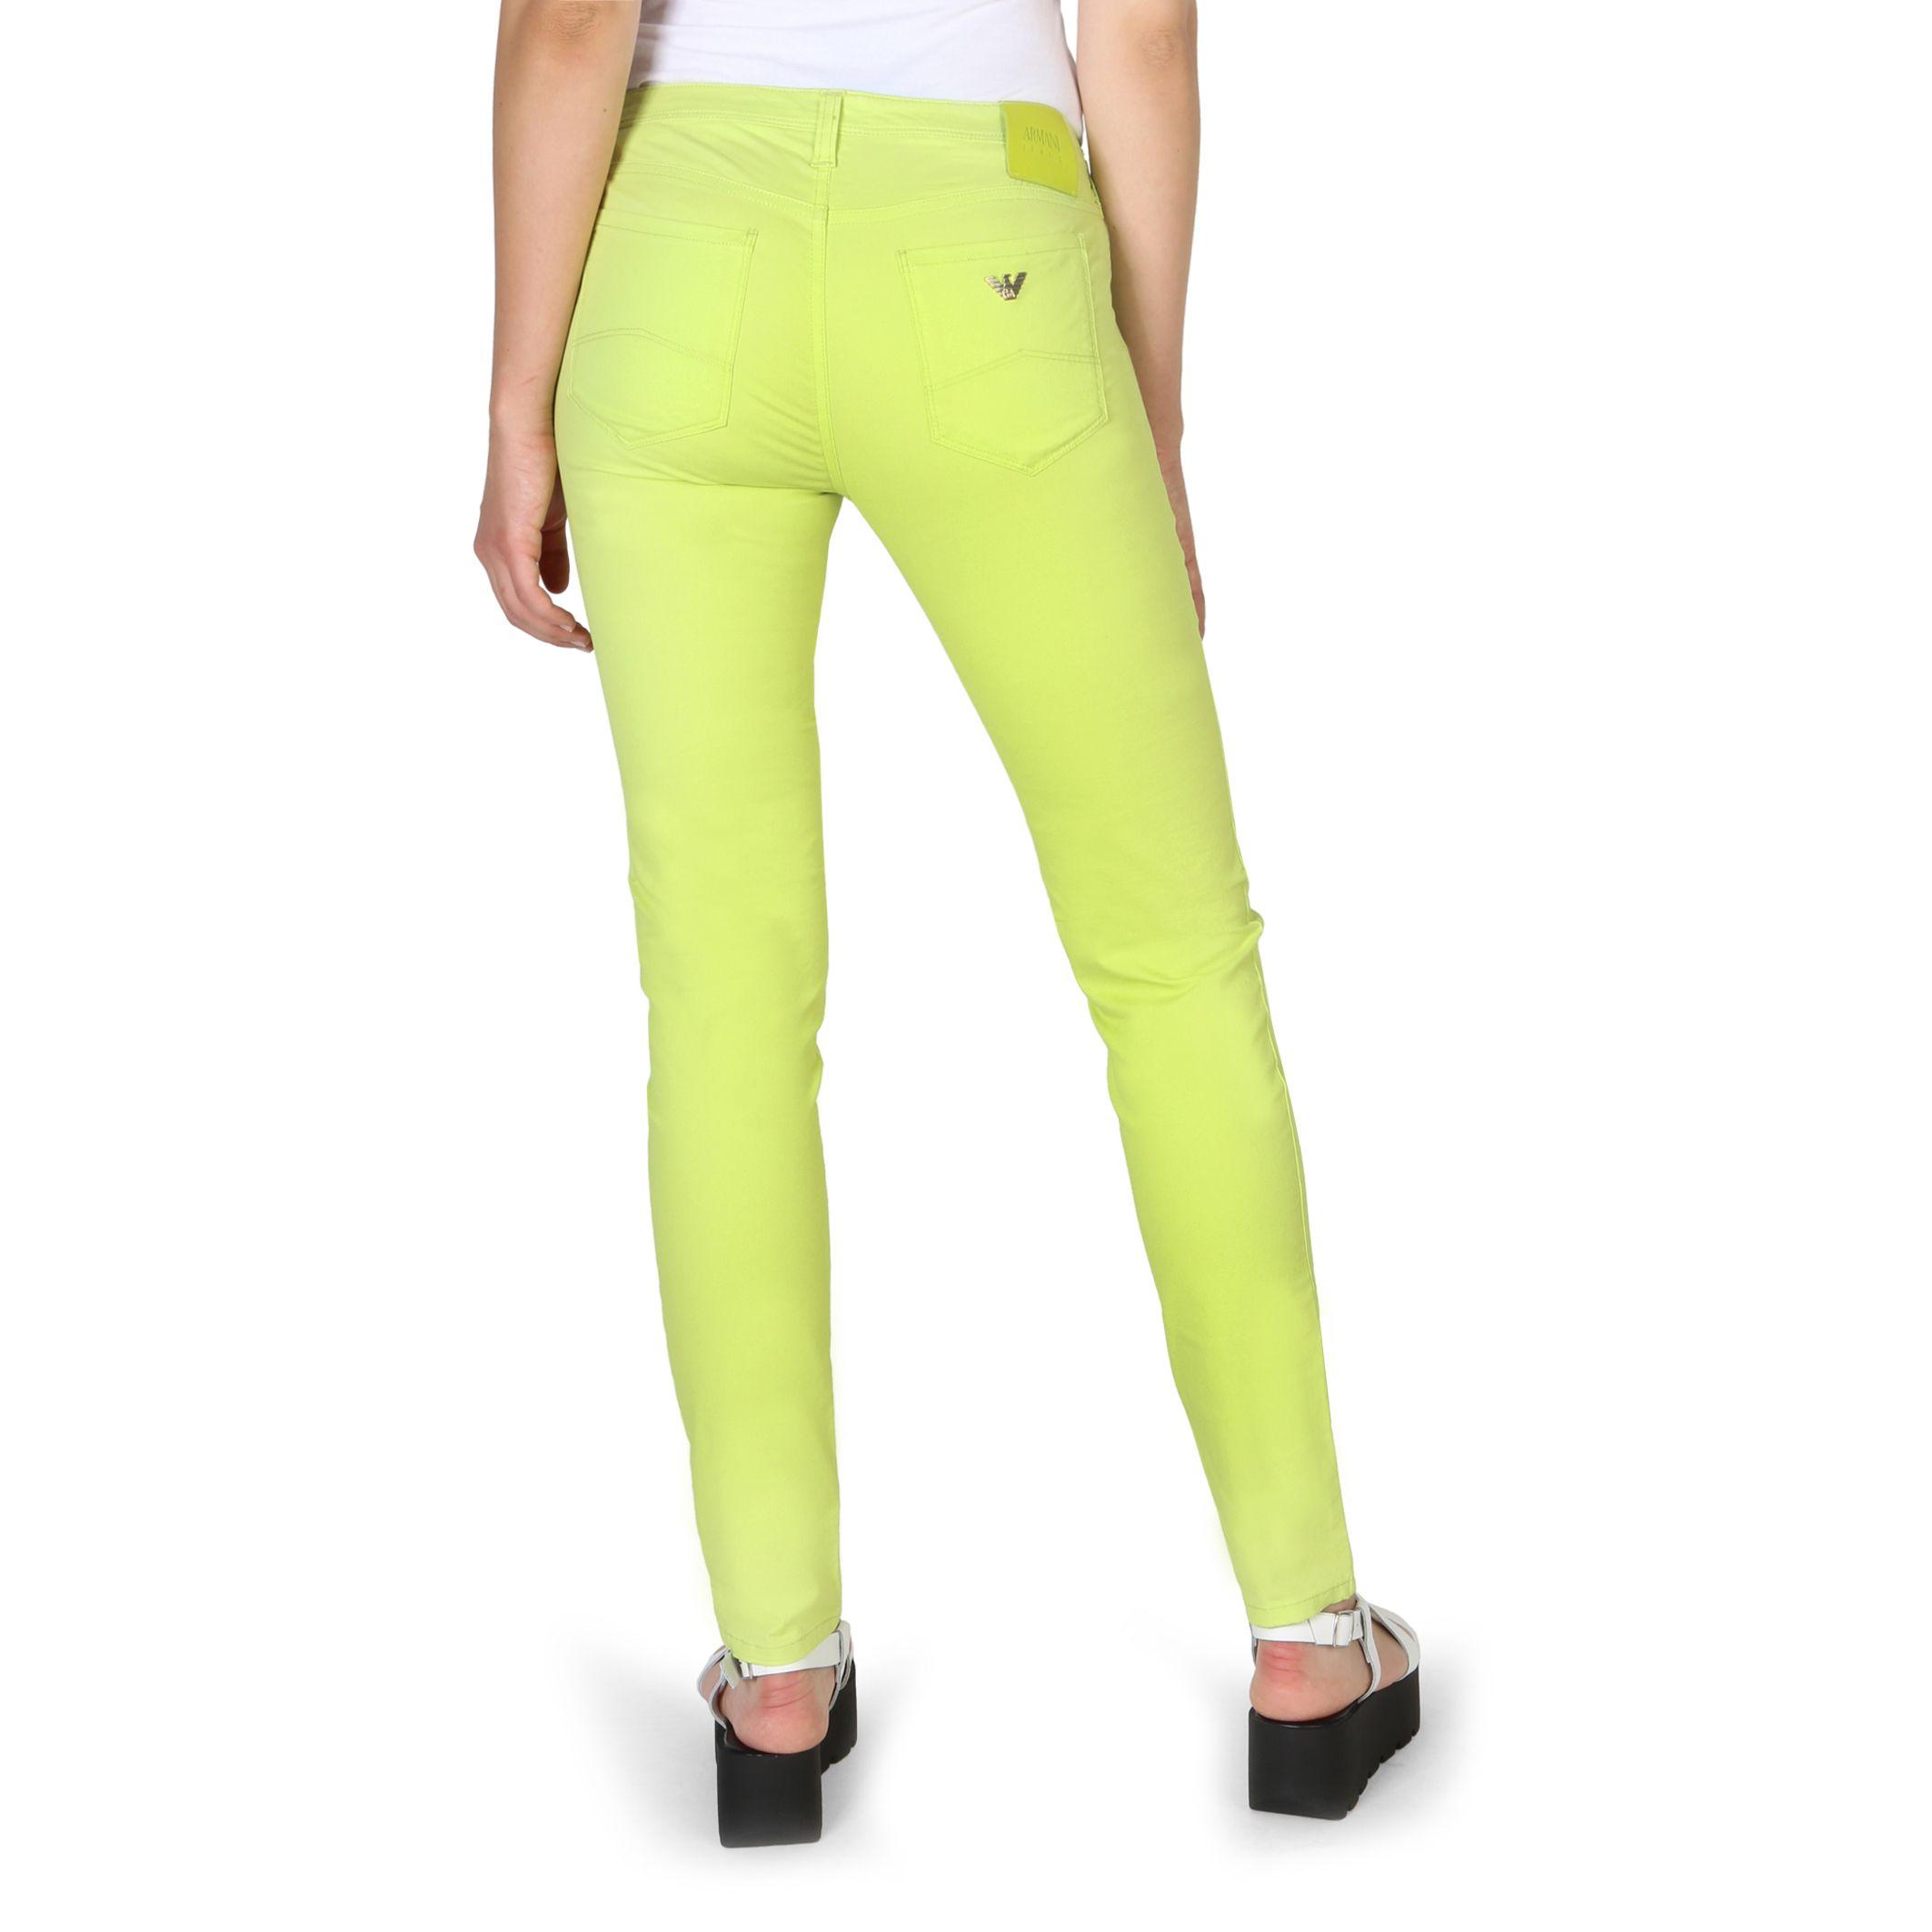 96Ac5130 A702 11Ea Aaa4 4Fcd1Fe36E6D Armani Jeans - 3Y5J28_5Nzxz - Green